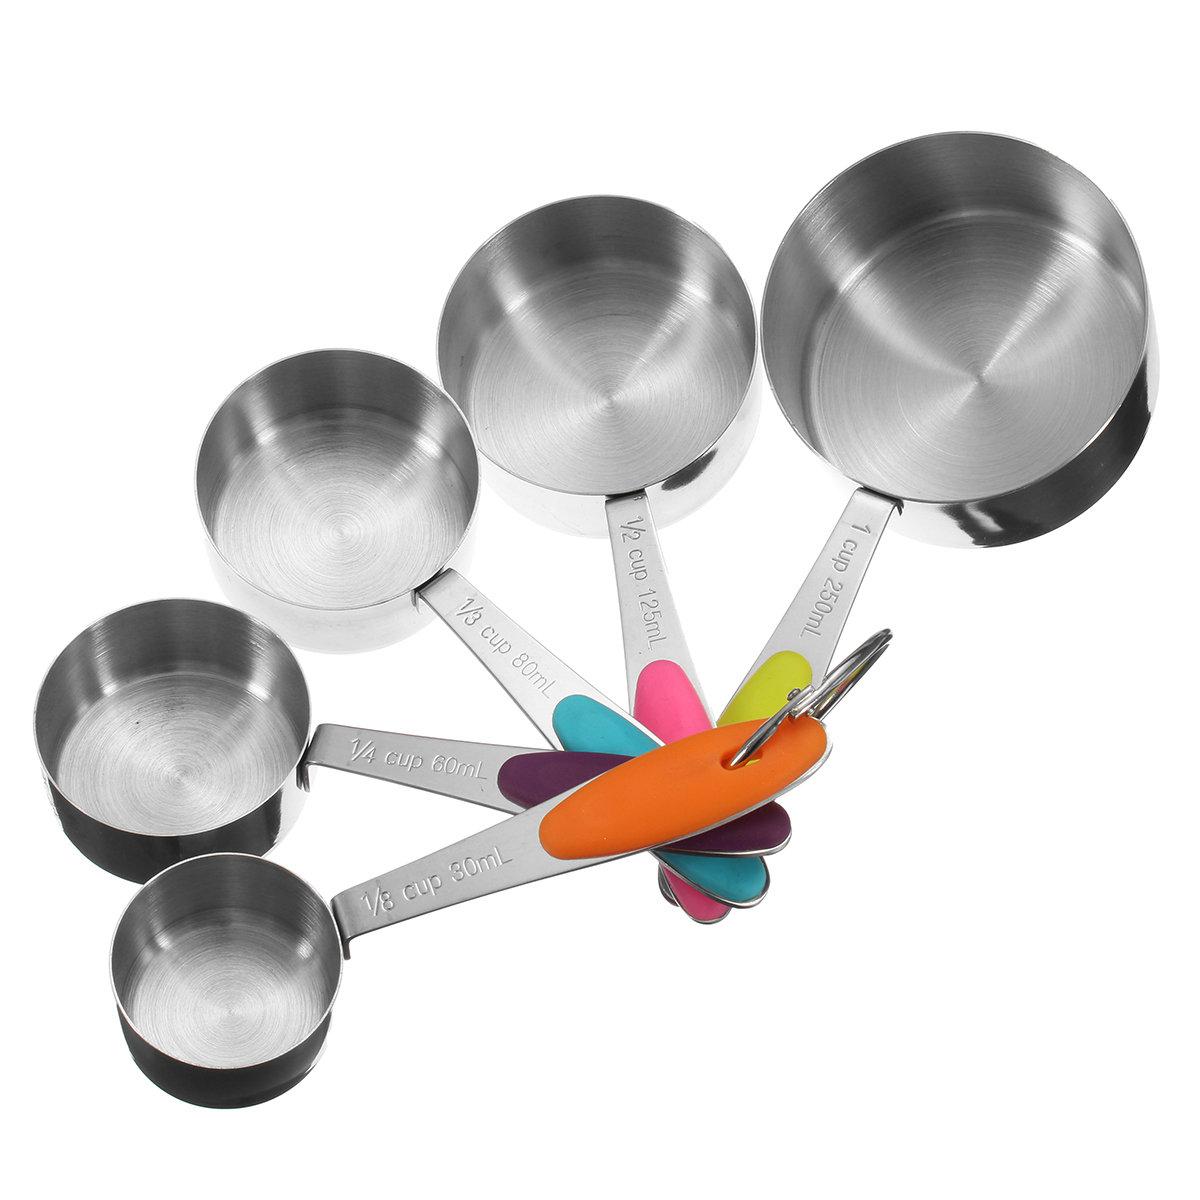 10pcs Stainless Steel Measuring Measure Spoons Baking